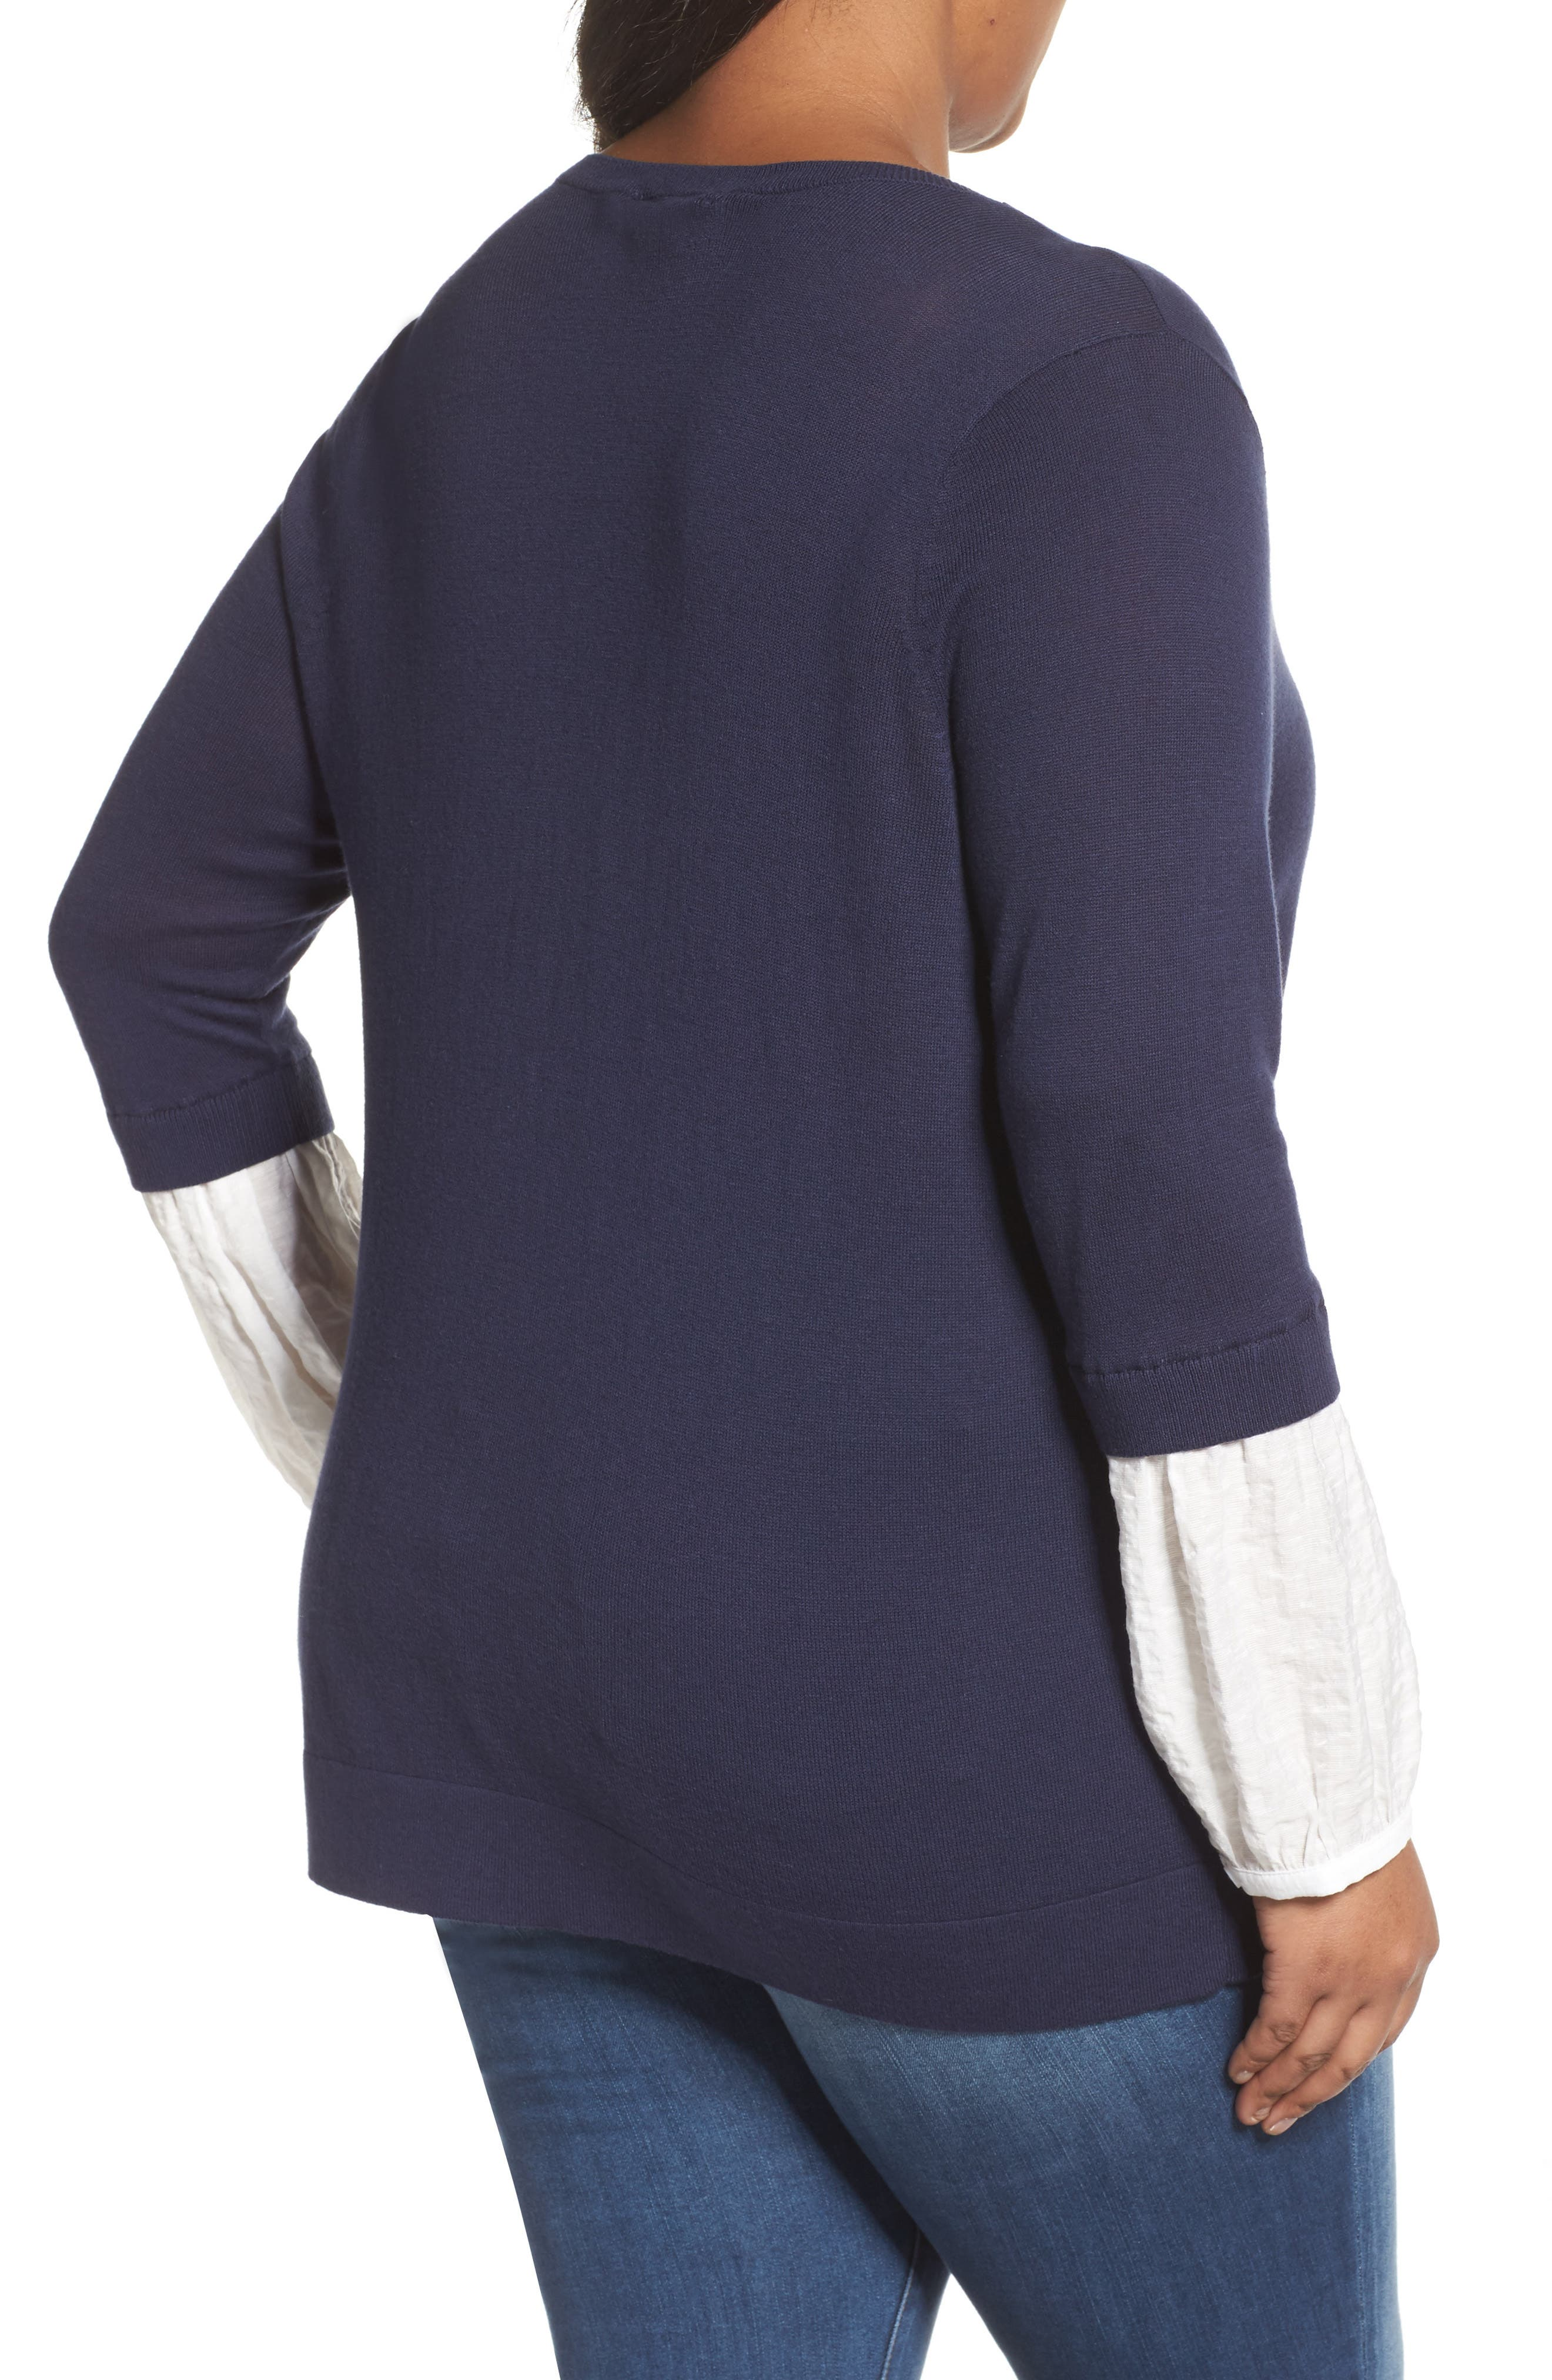 Mix Media Sweater,                             Alternate thumbnail 2, color,                             Navy- White Combo